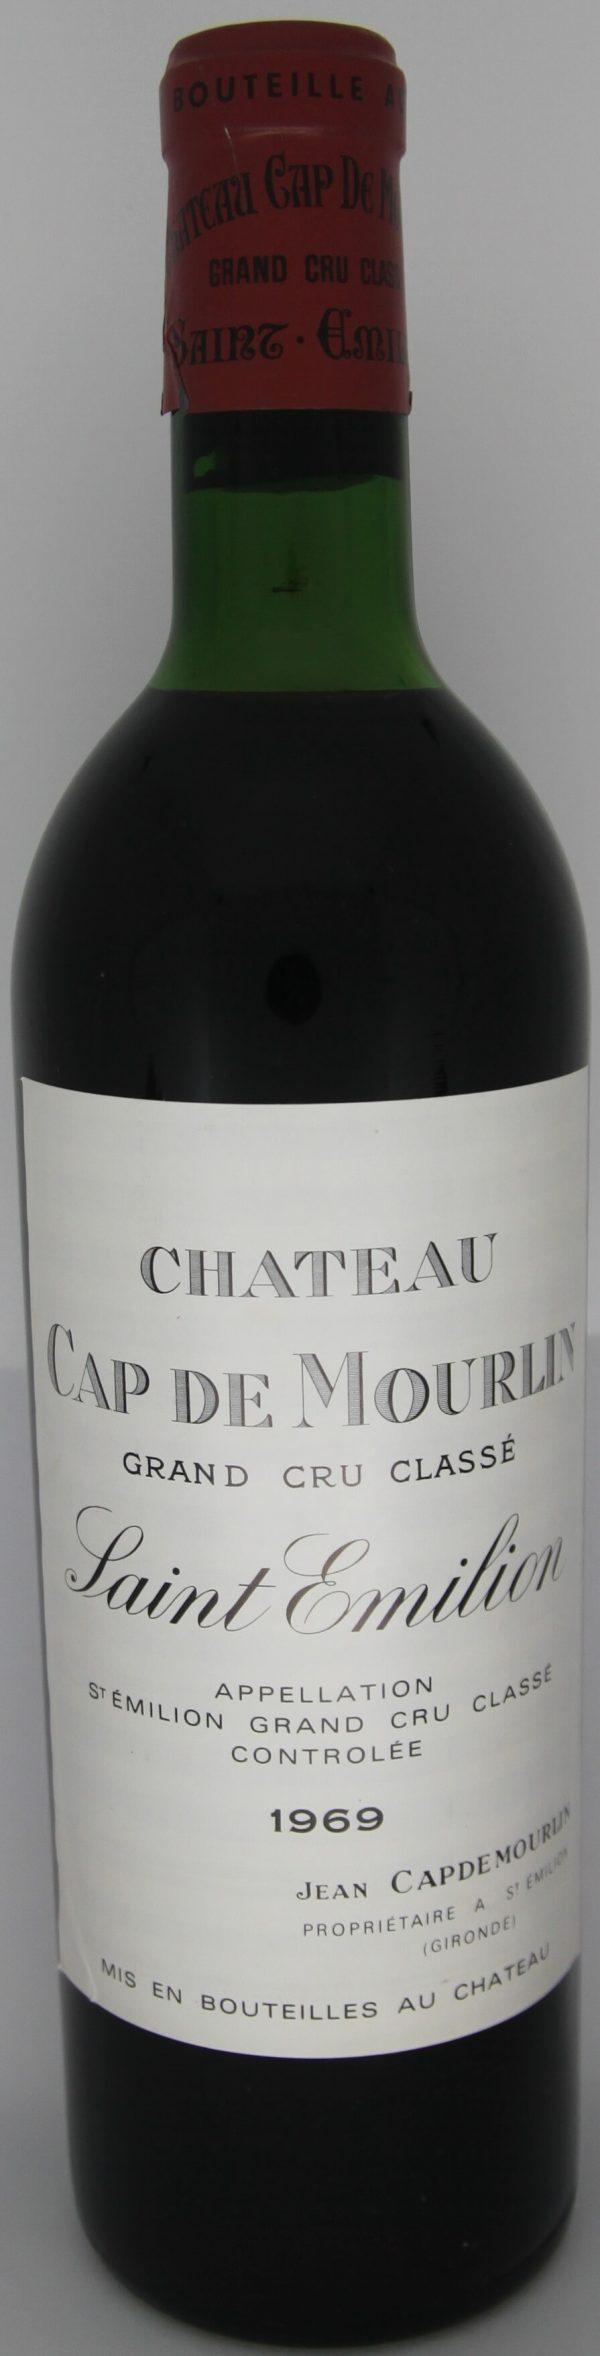 1969 Chateau Cap de Mourlin Saint-Emilion Grand Cru